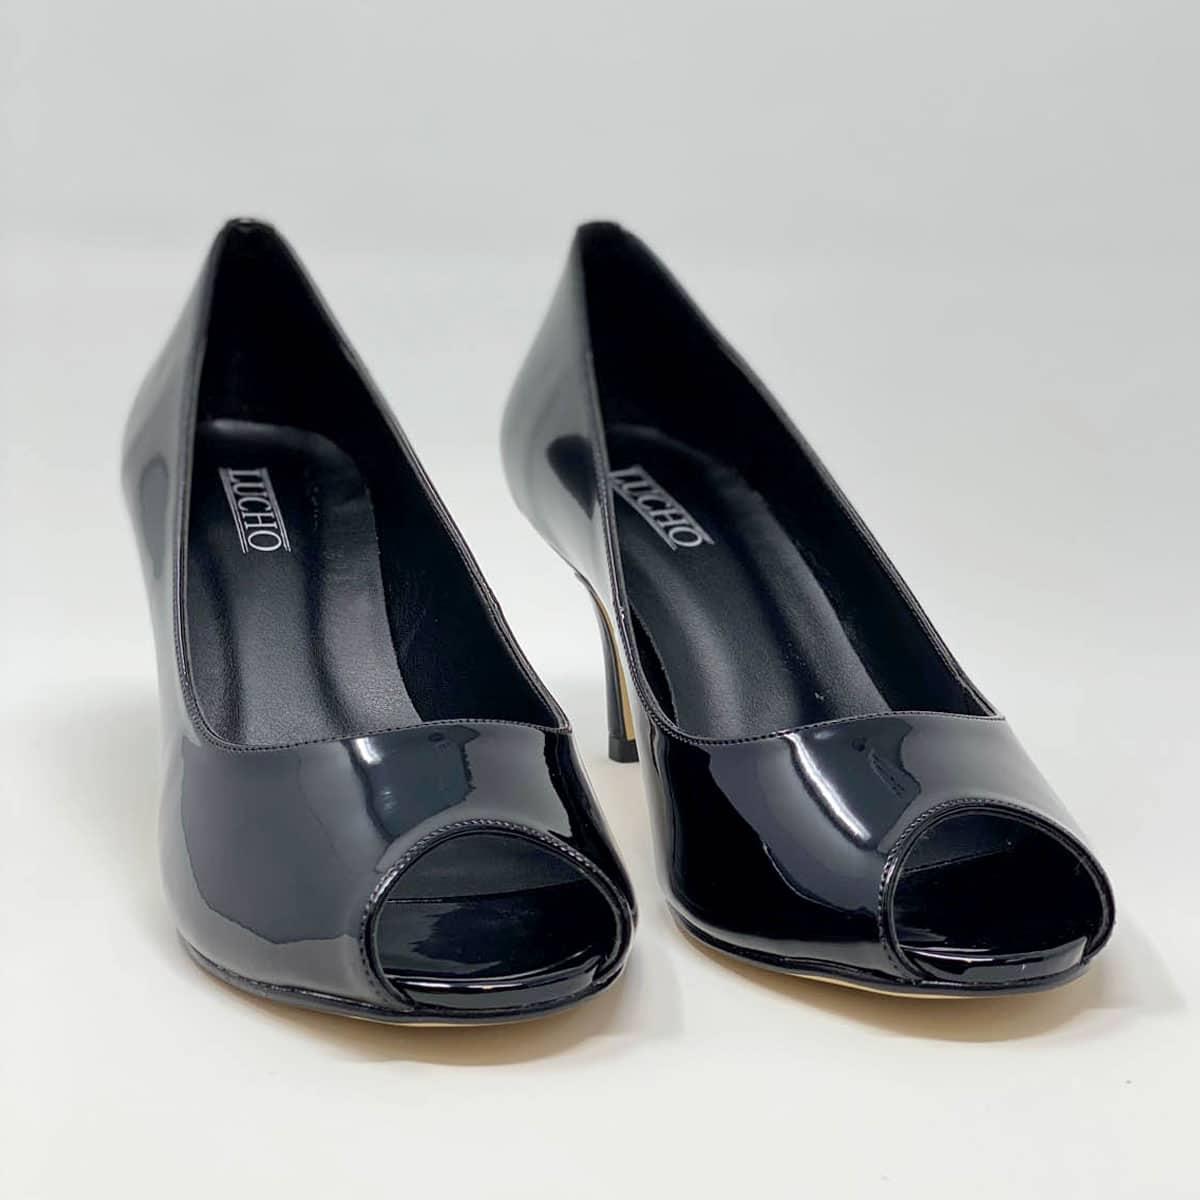 Black Kitten Heel Open Toe Pump